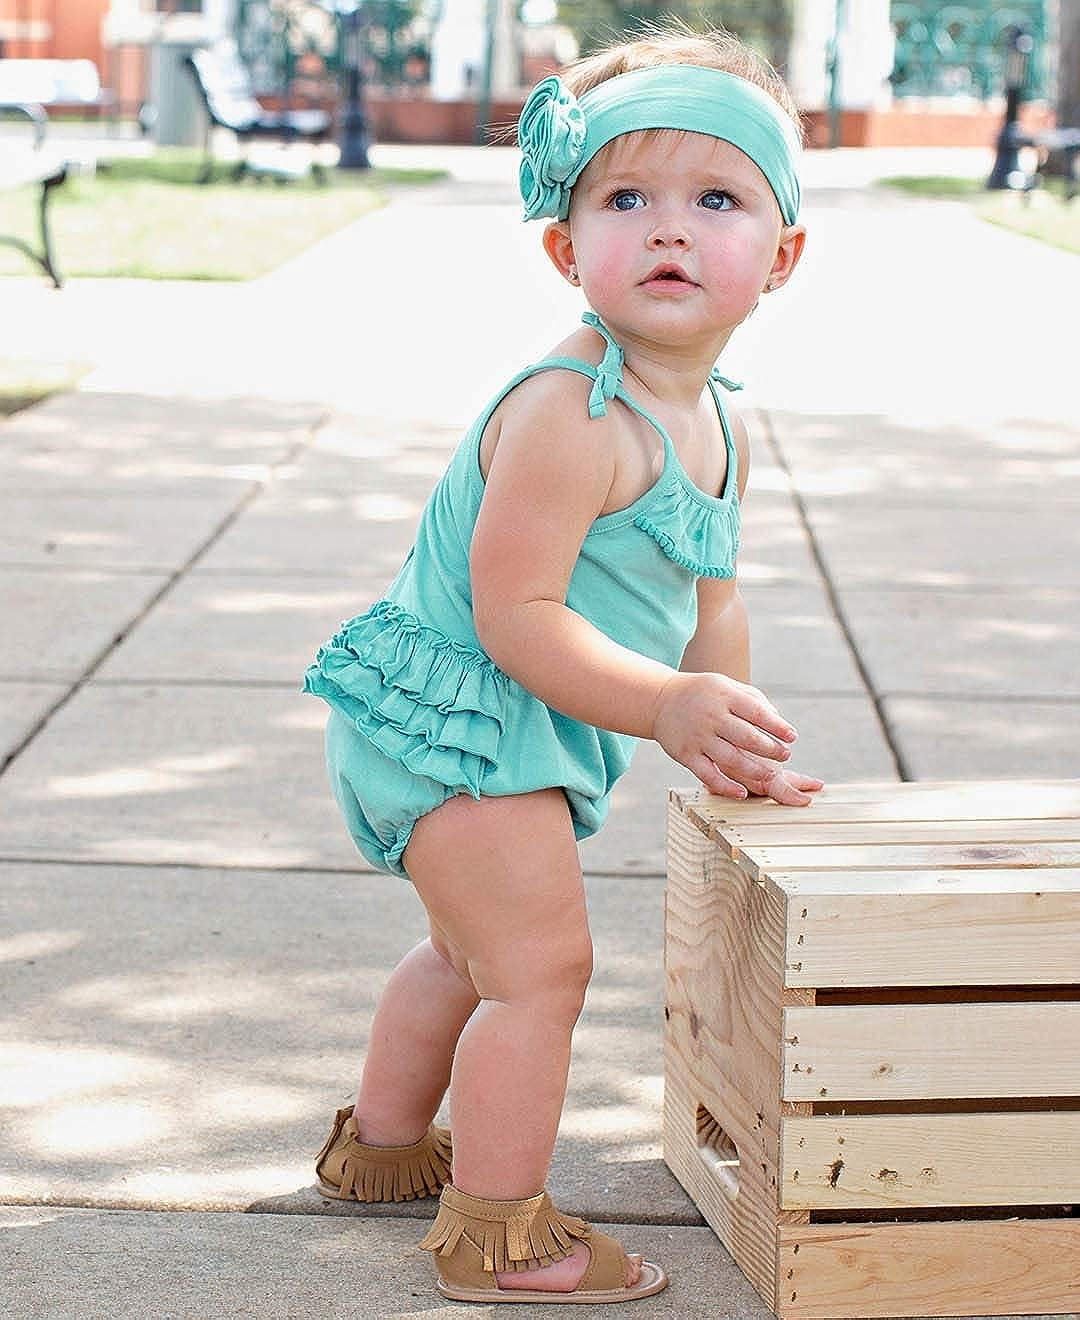 f80fcd1923c4 Amazon.com  RuffleButts Baby Toddler Girls Knit Pom Pom Bubble Romper  w Ruffles  Clothing